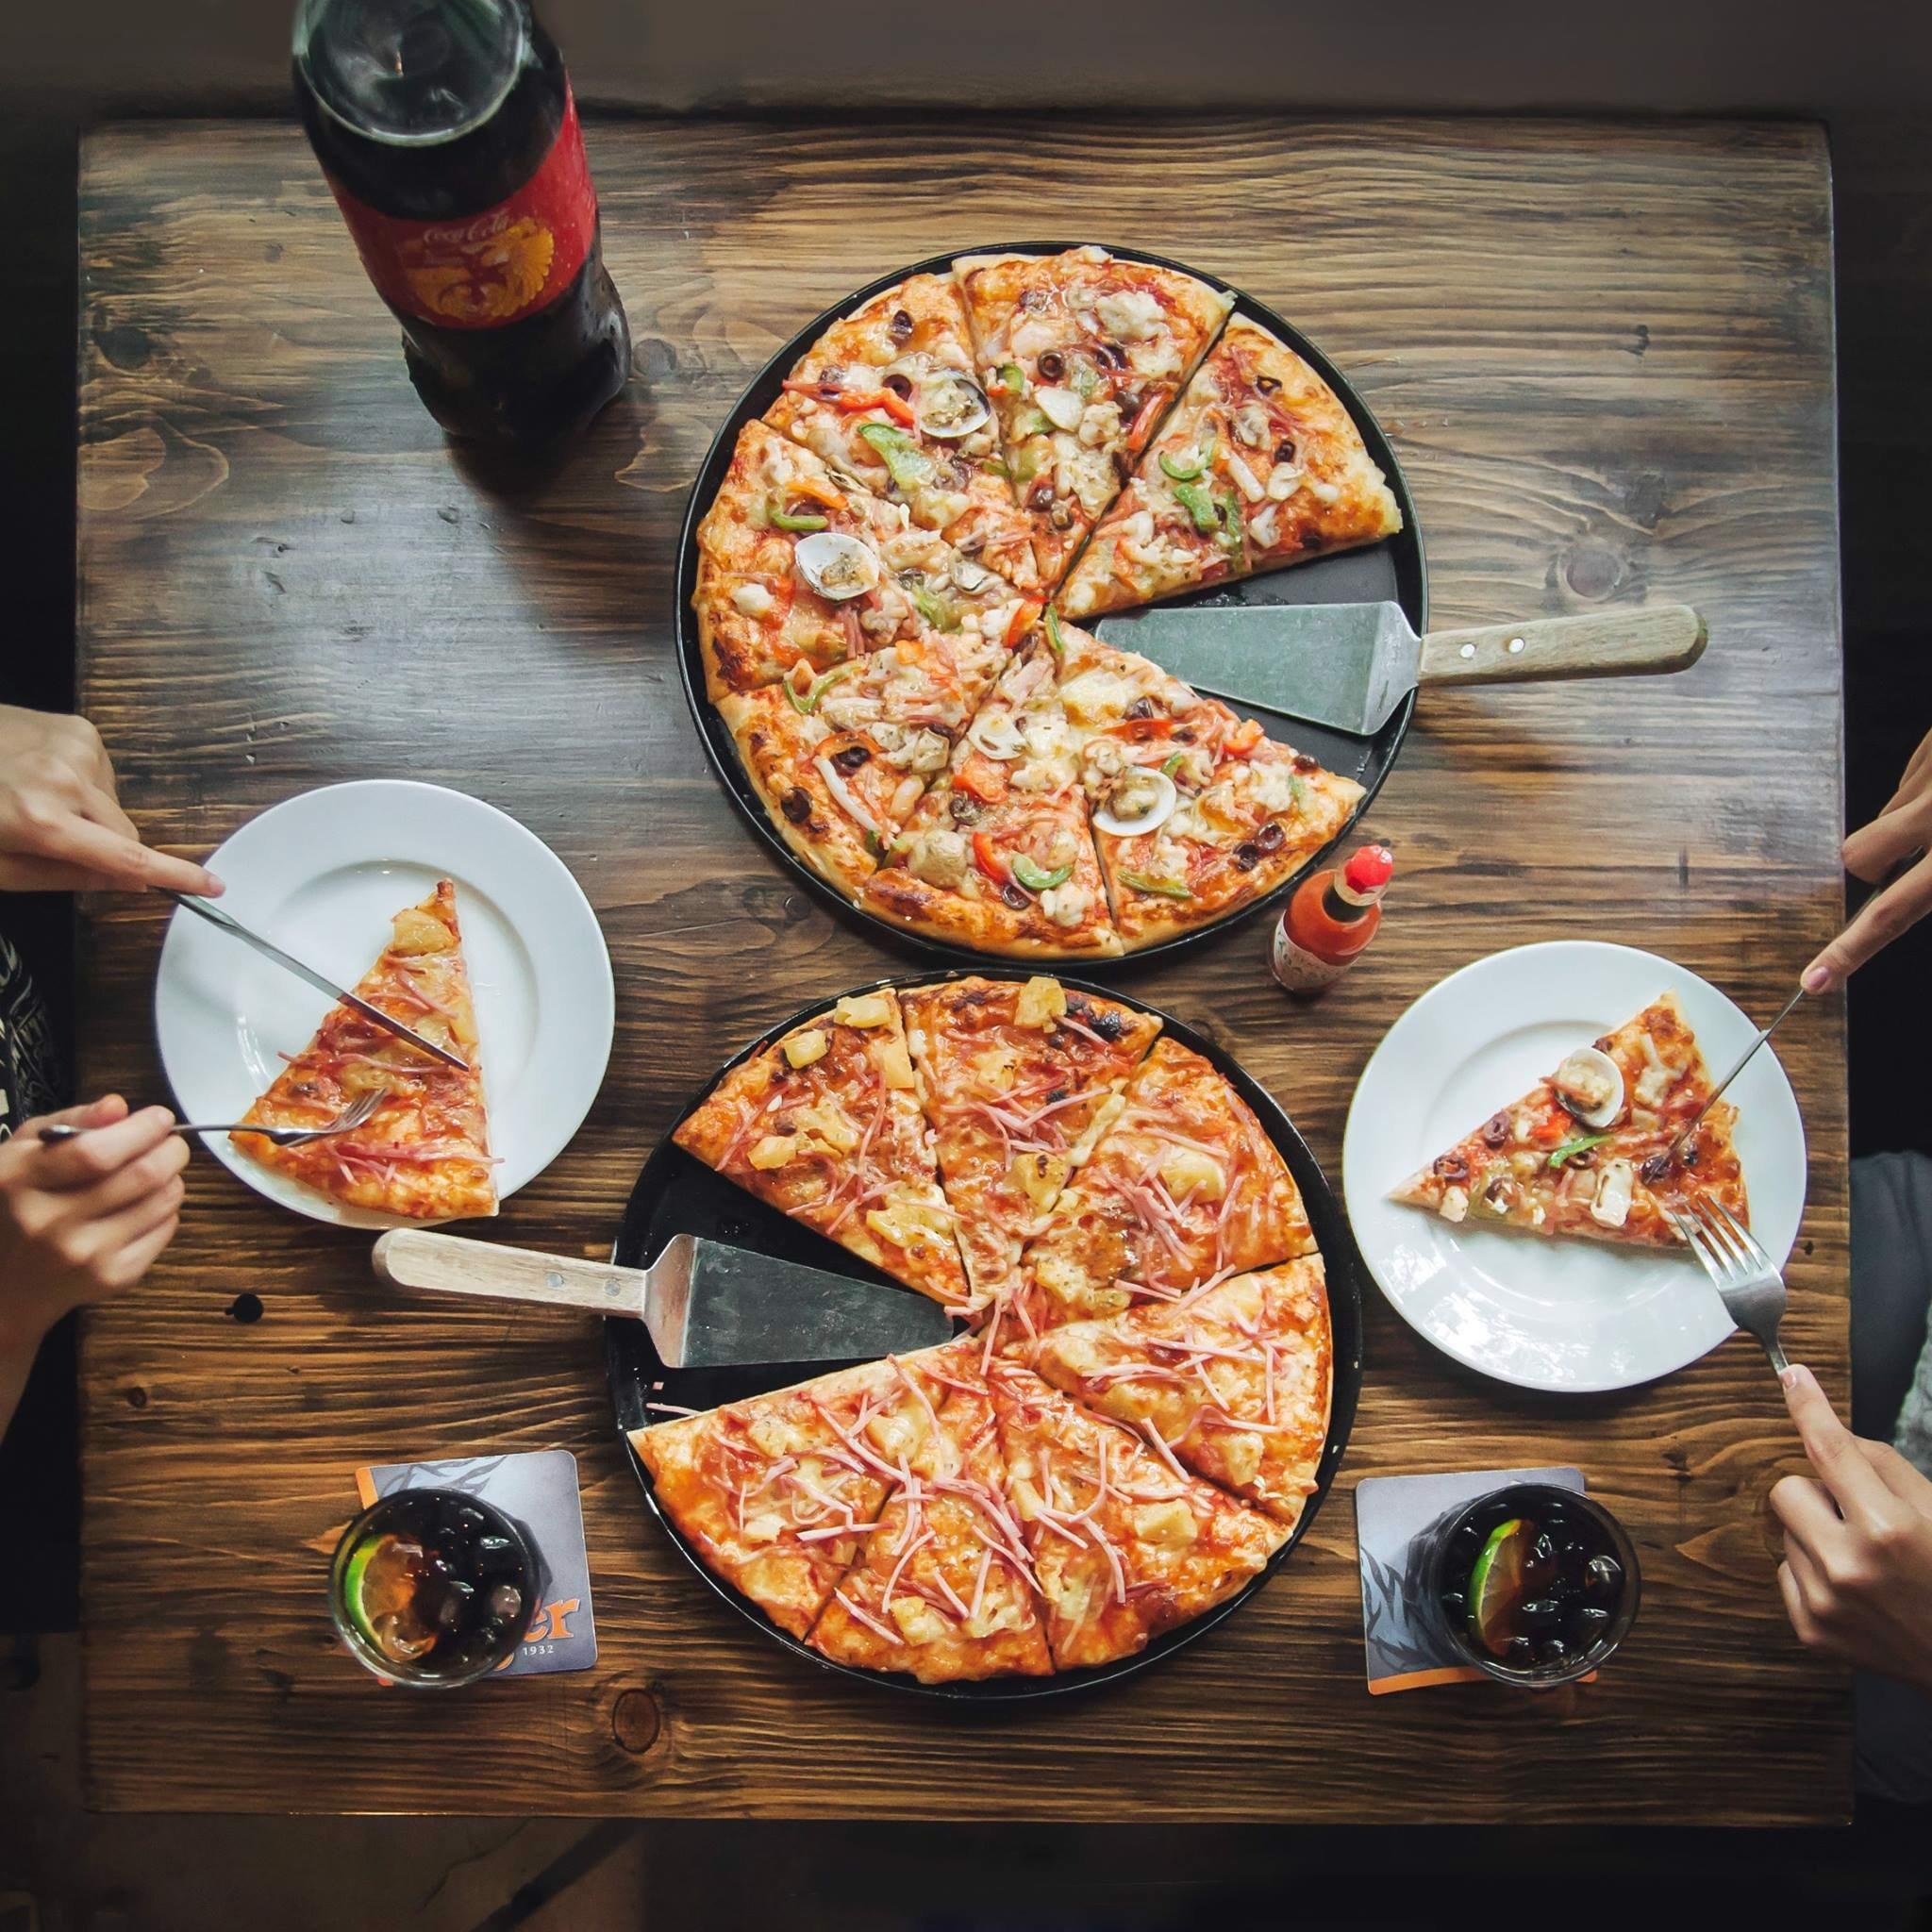 pizza hai ba trung al freco's